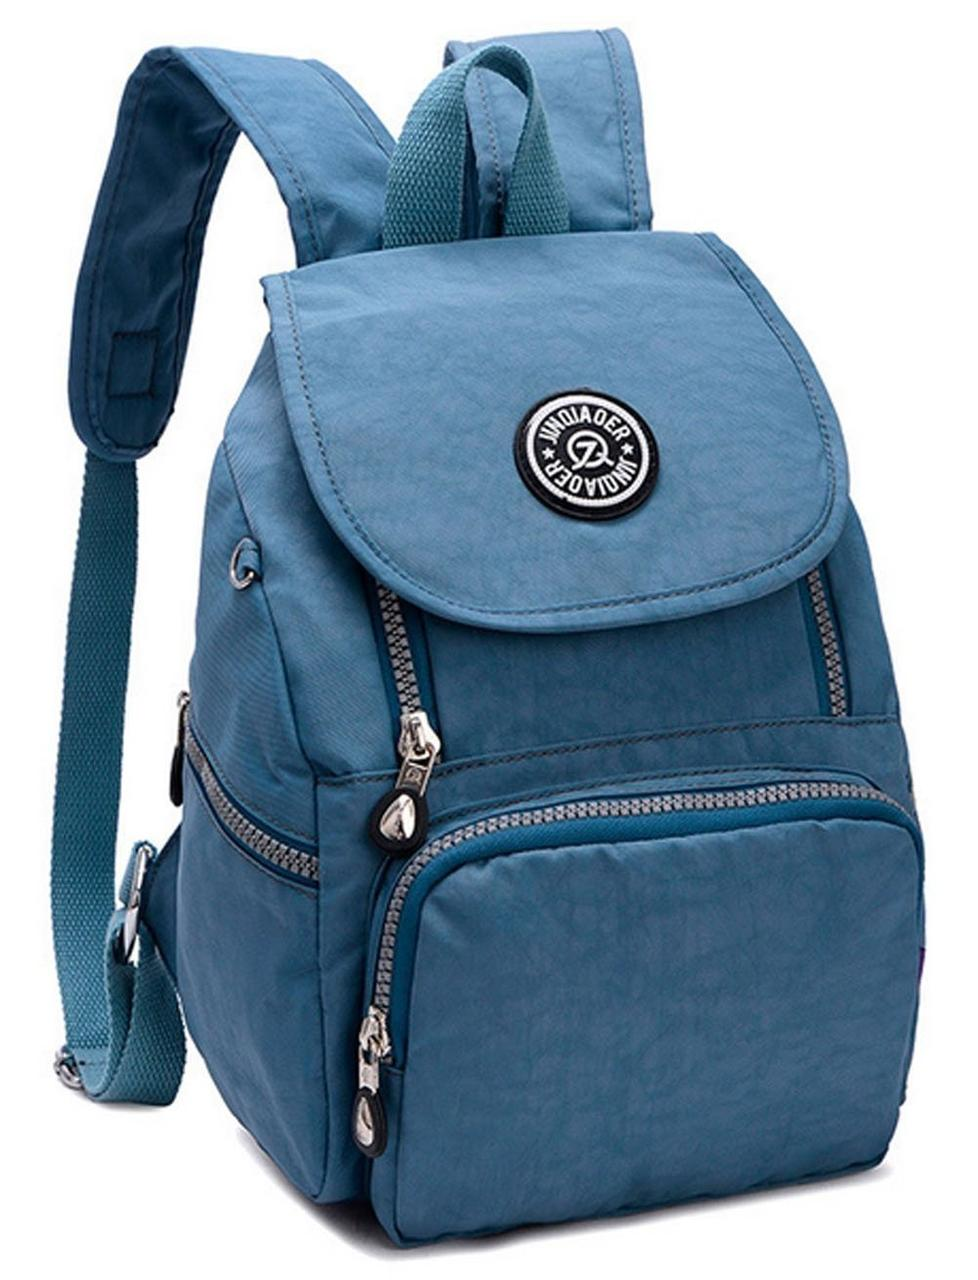 Рюкзак нейлоновый Jinuaer 30х21х10см Серо-голубой (02007/01)